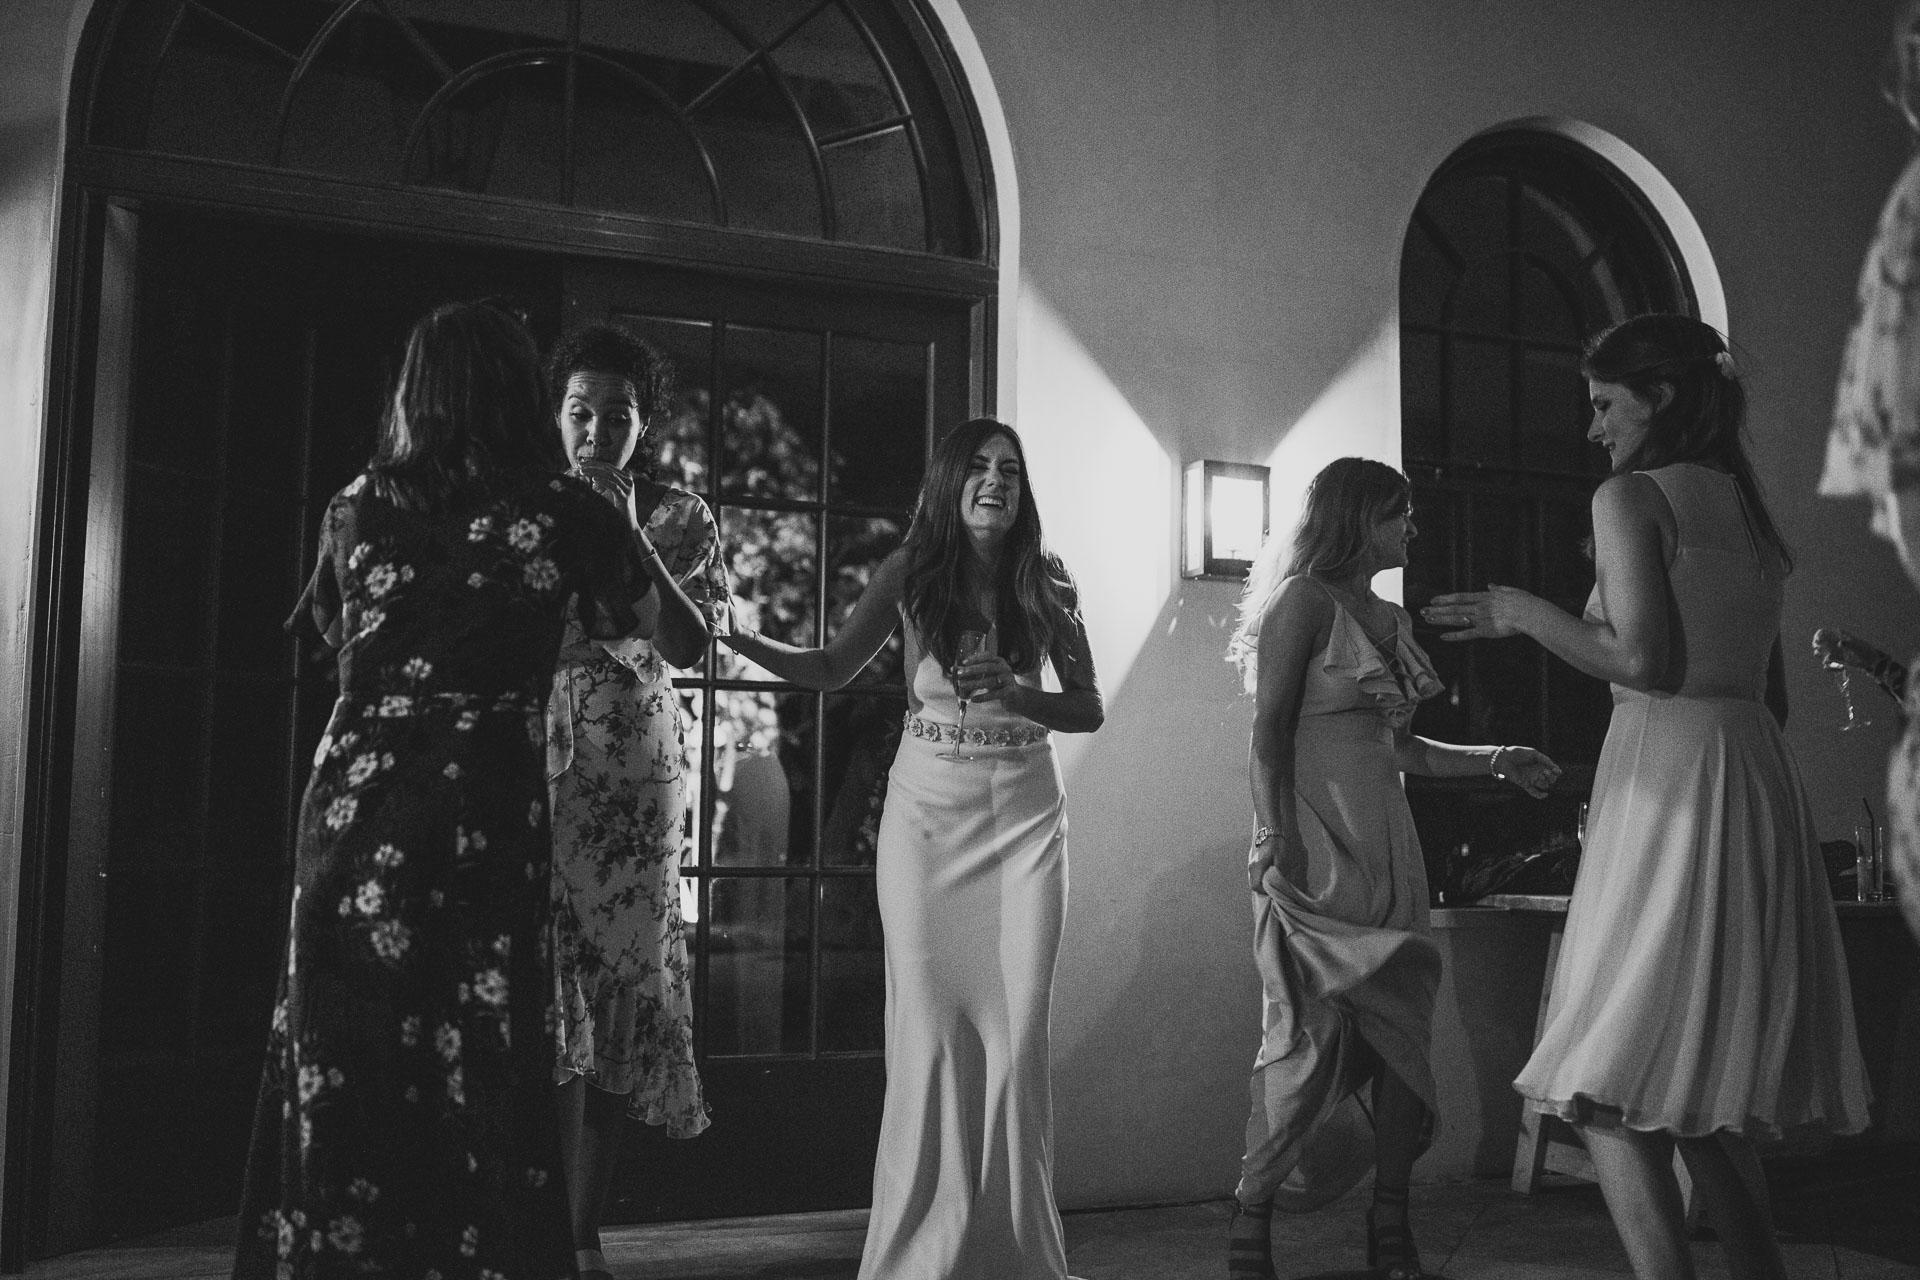 middleton_lodge_wedding_photographer-137.jpg